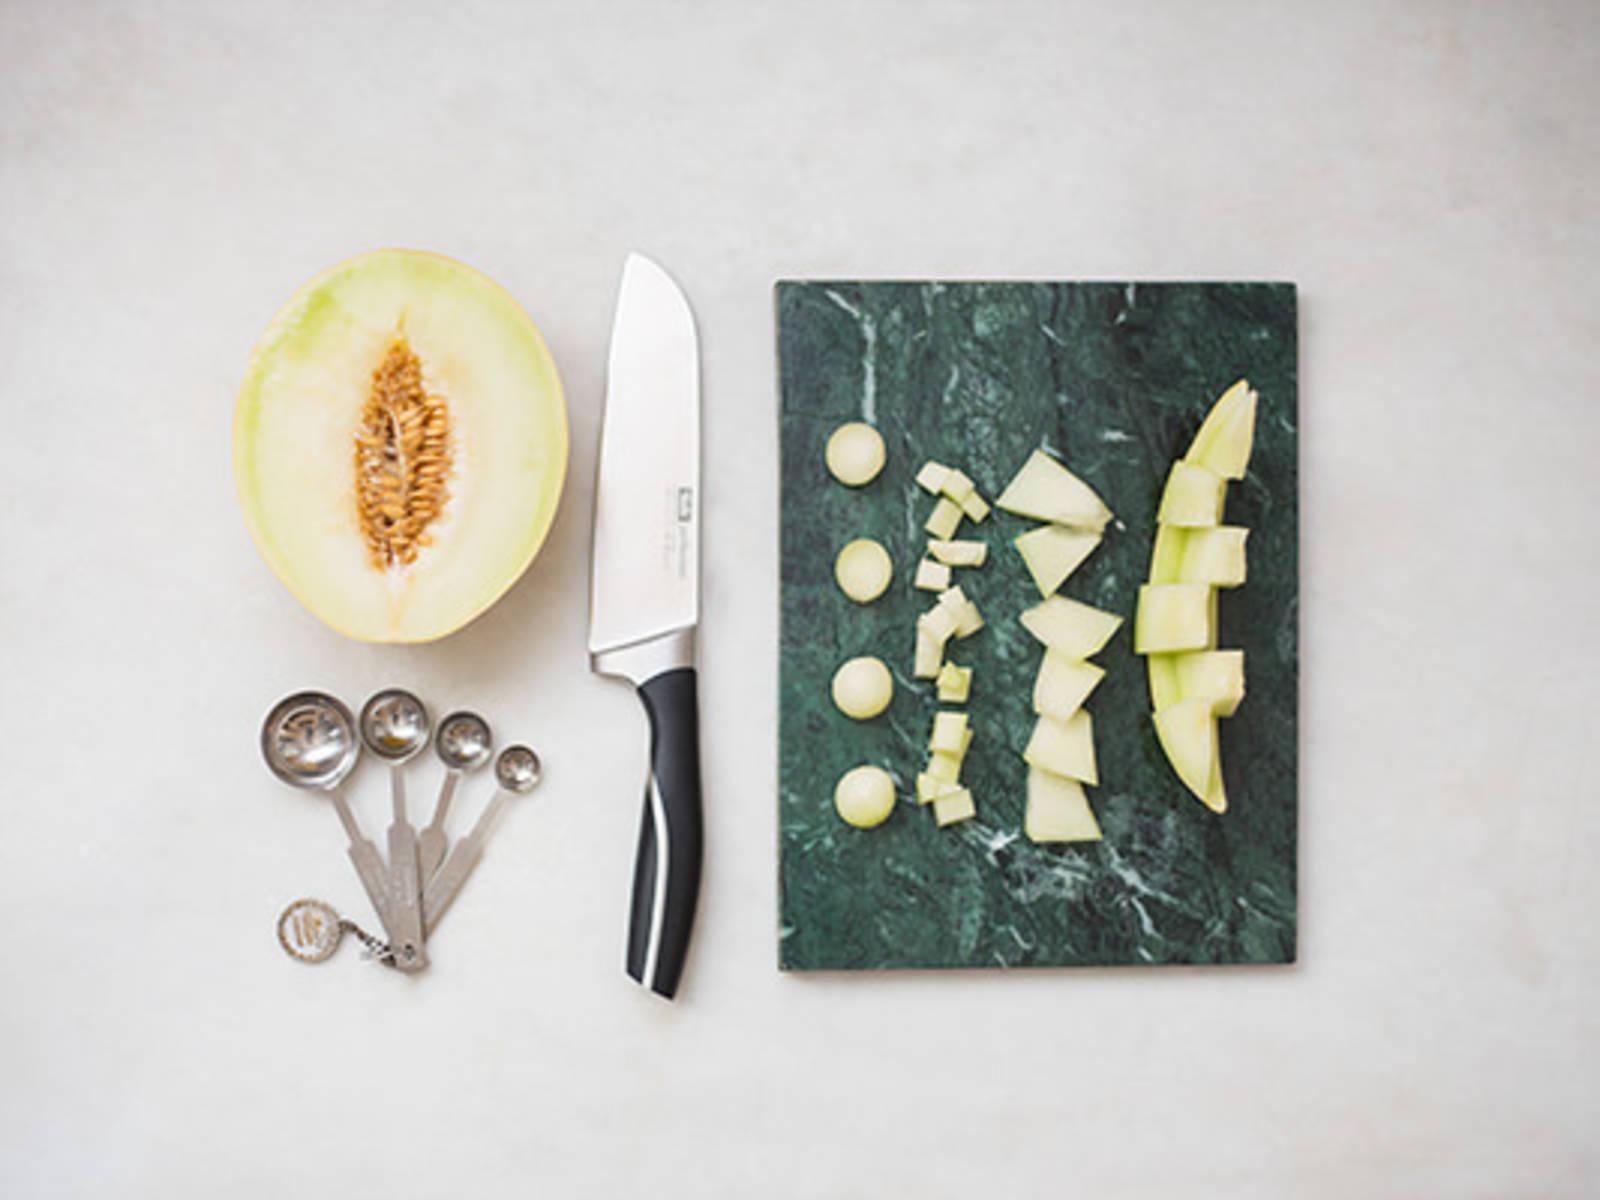 How to prepare a honeydew melon